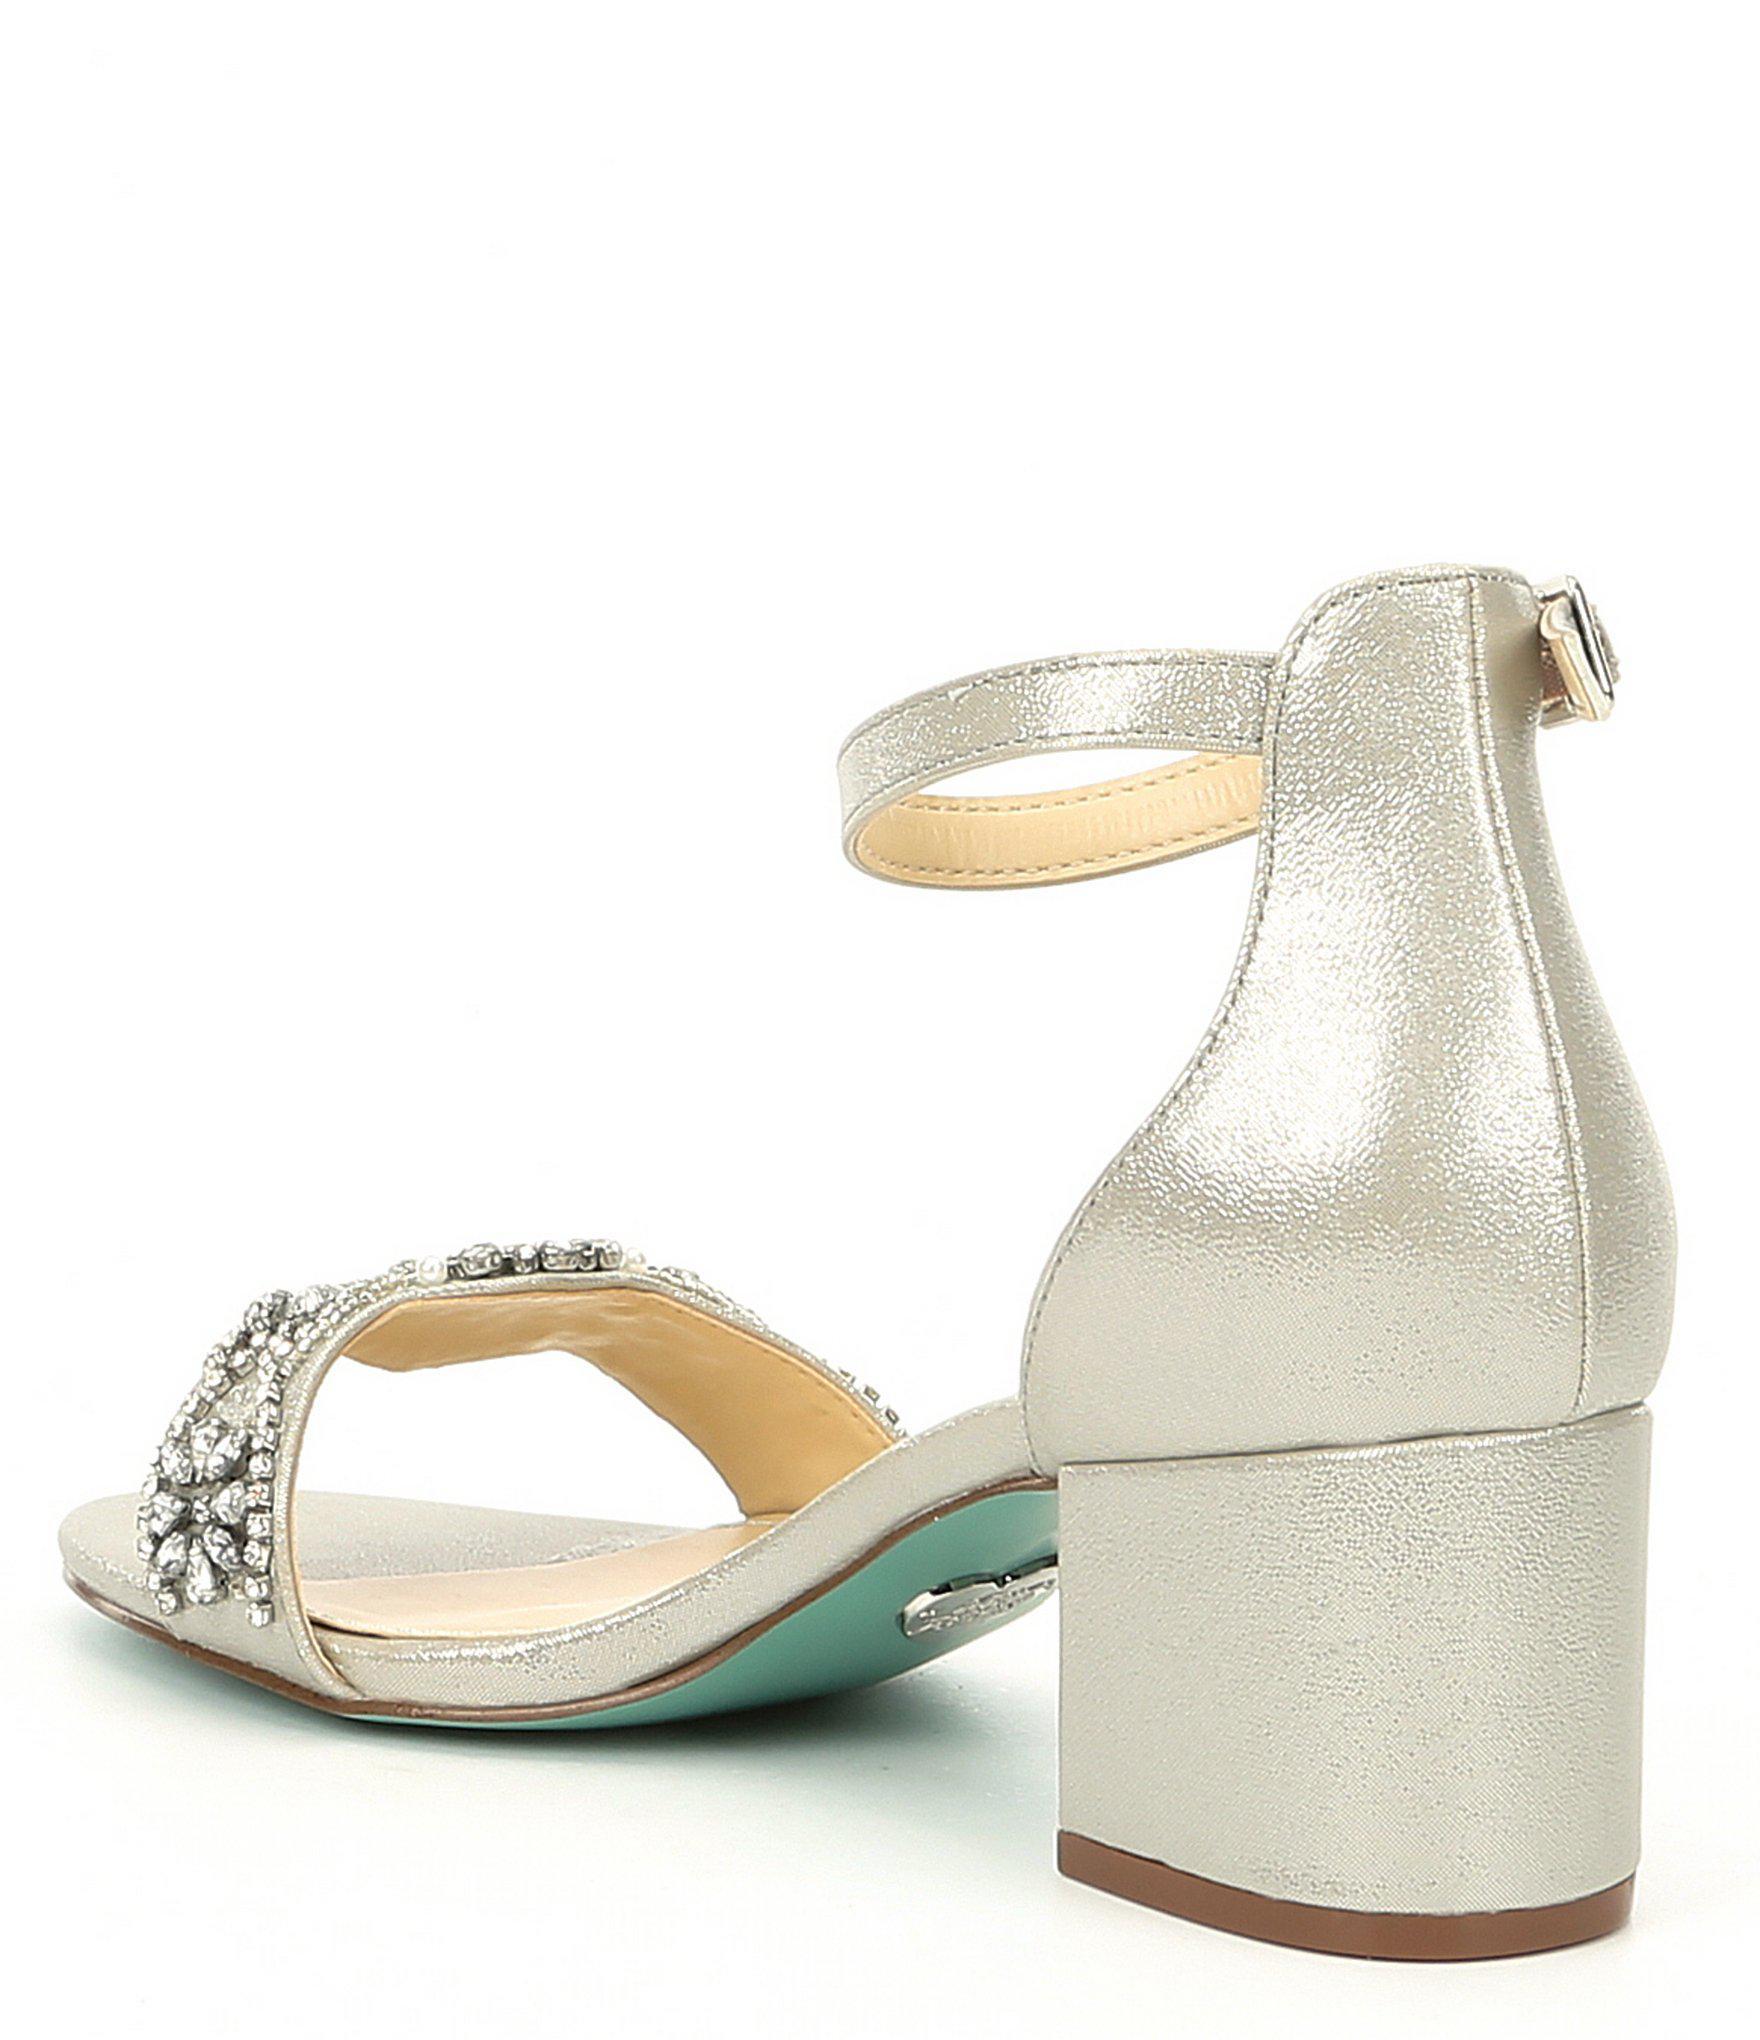 738872a919 Betsey Johnson - Metallic Blue By Mel Bejeweled Satin Block Heel Dress  Sandals - Lyst. View fullscreen